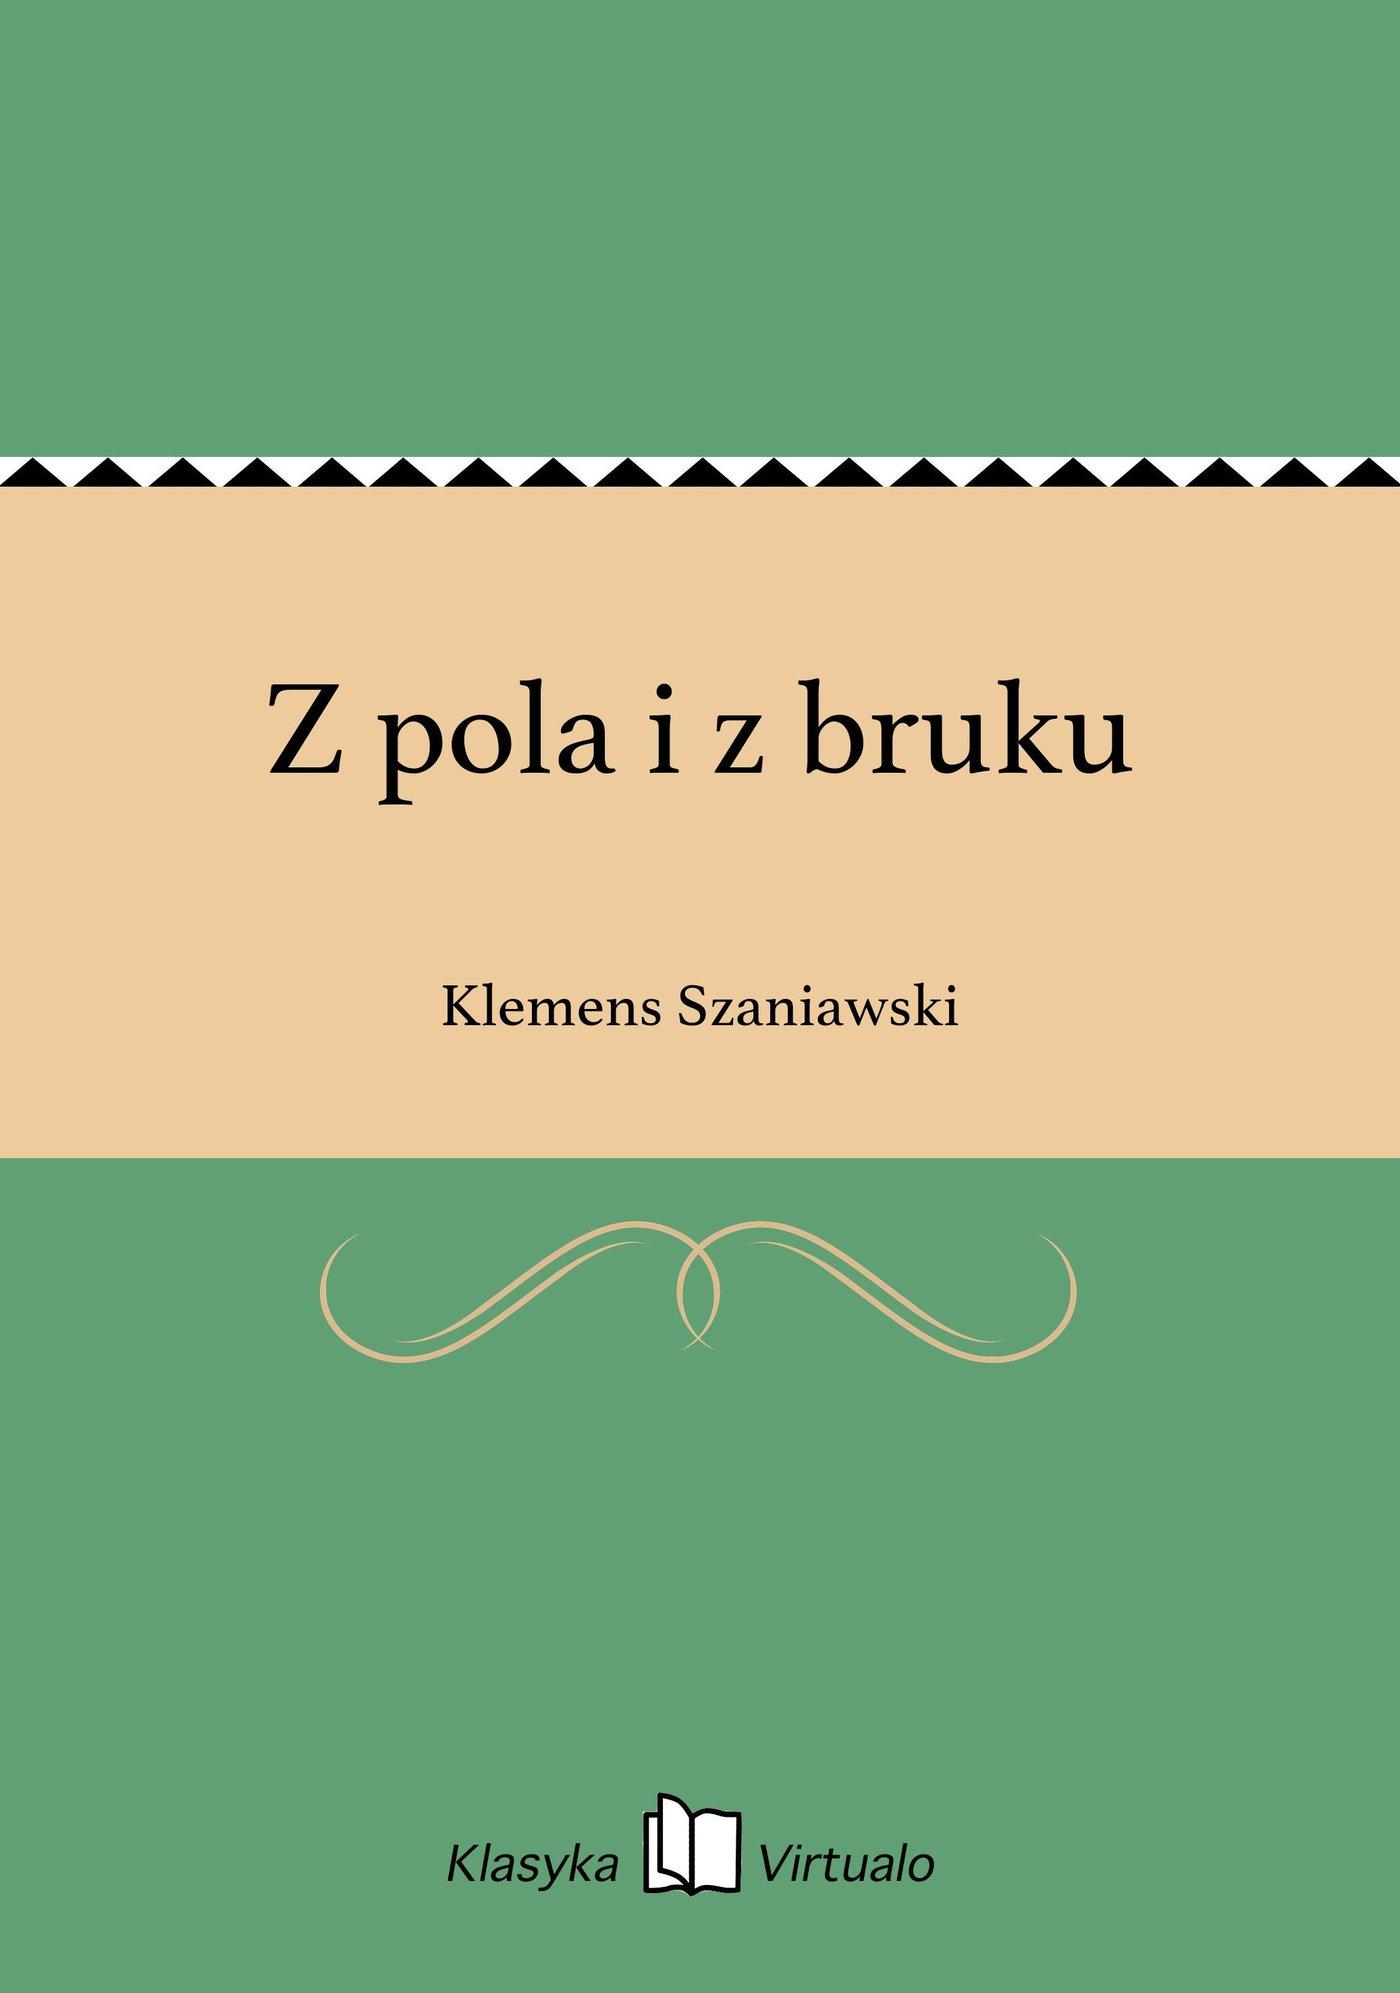 Z pola i z bruku - Ebook (Książka na Kindle) do pobrania w formacie MOBI